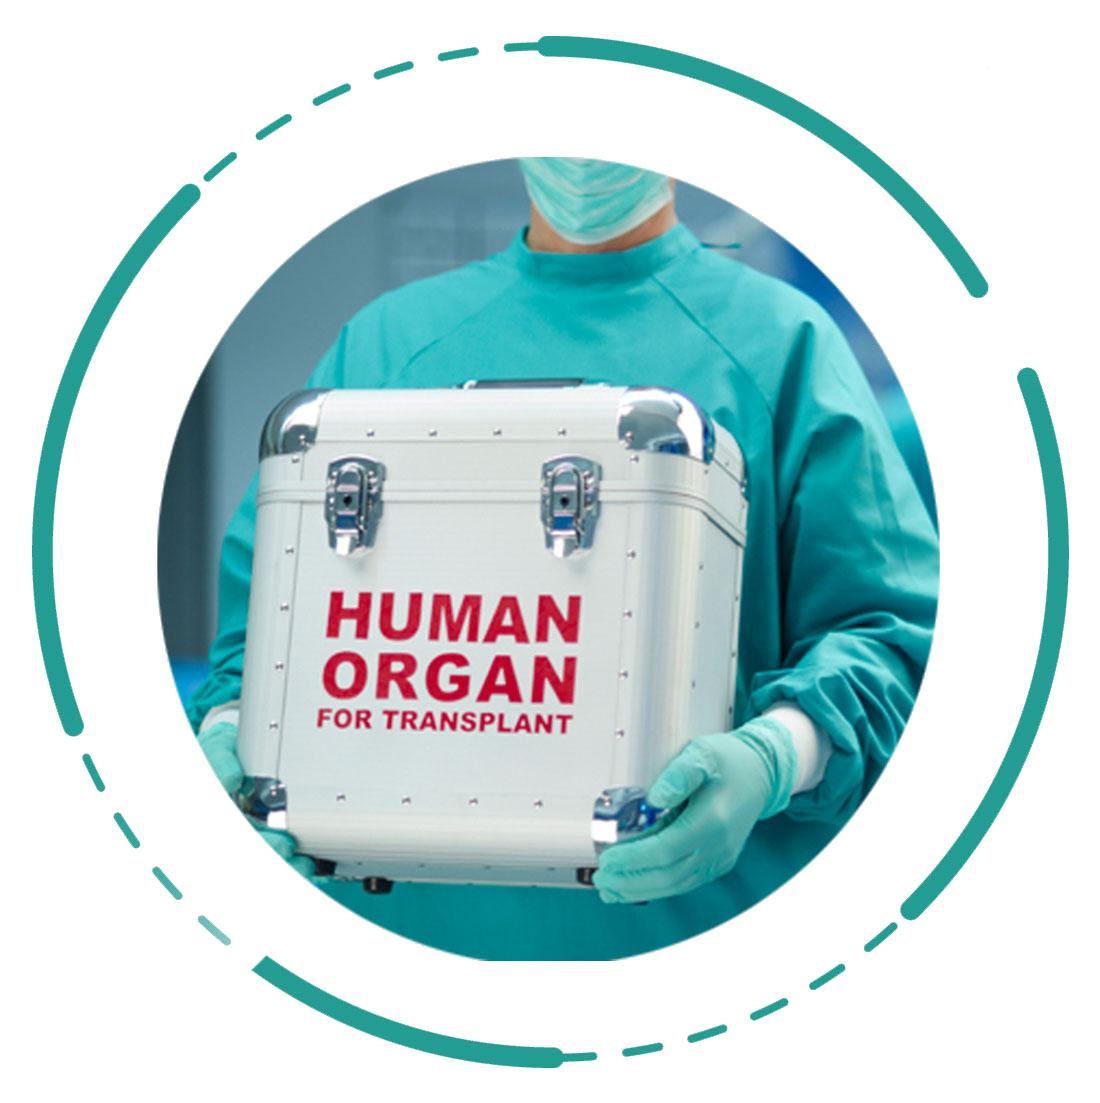 Organ-Transplant-Icon